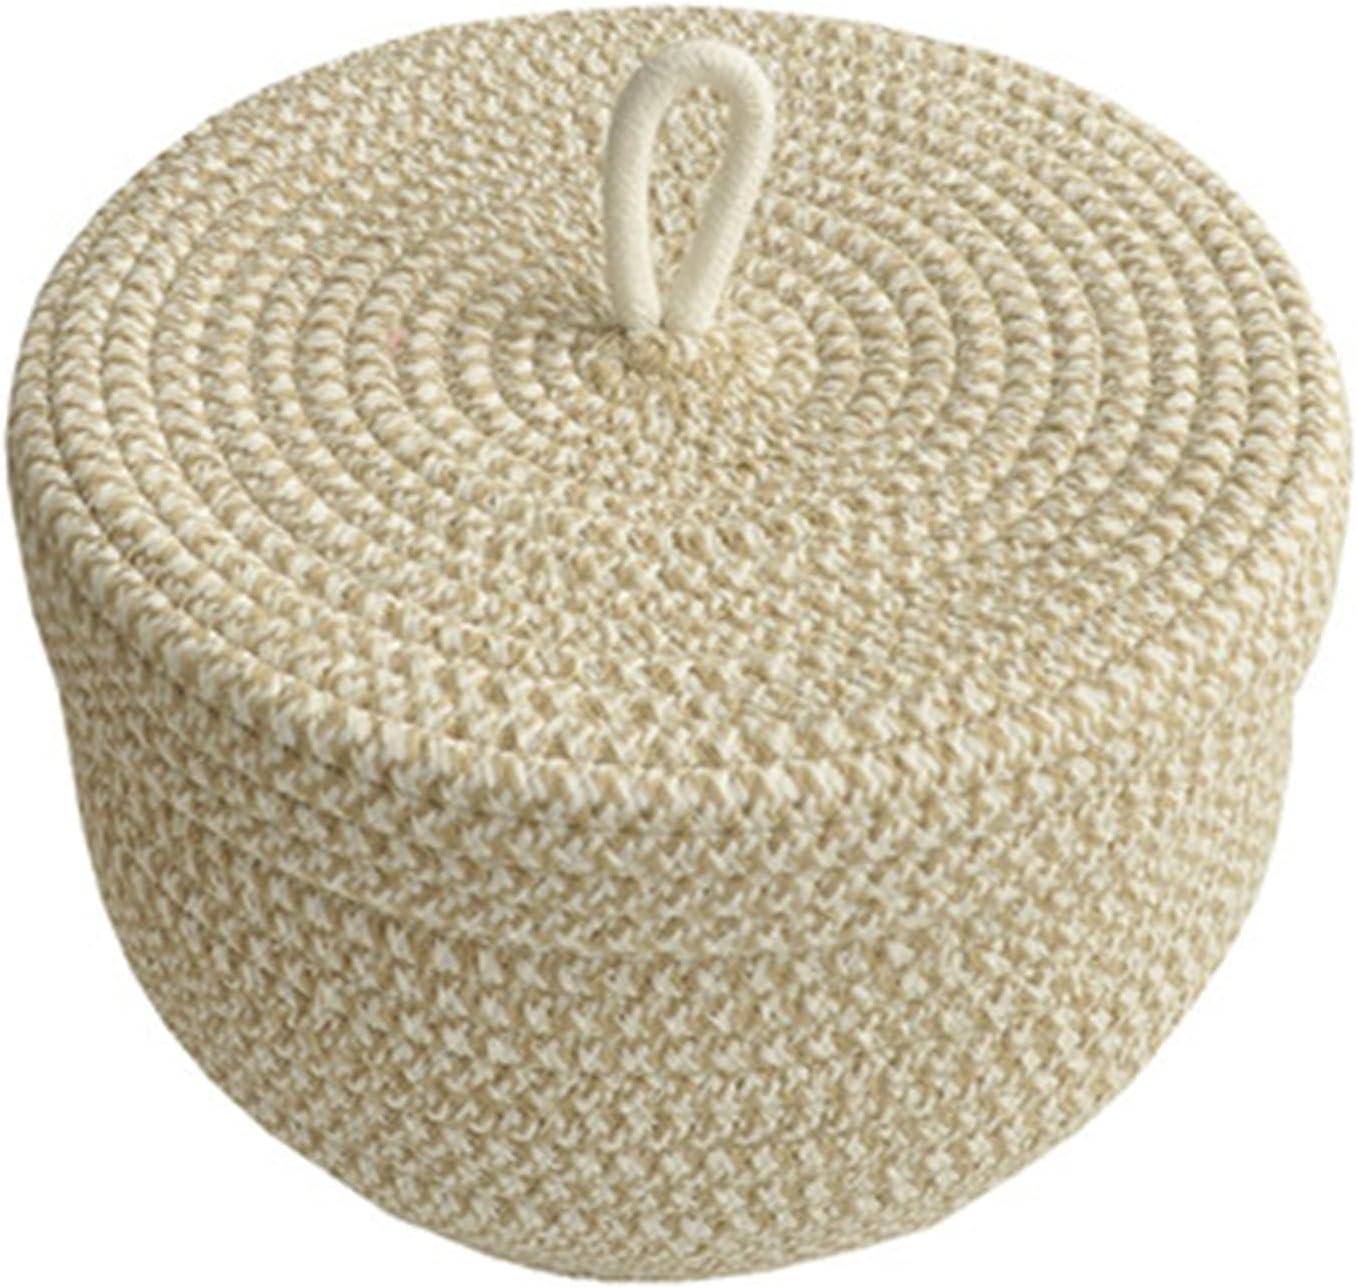 ZFF Egg Basket - Japanese Sacramento Mall Rope Cotton Storage Style Price reduction Woven